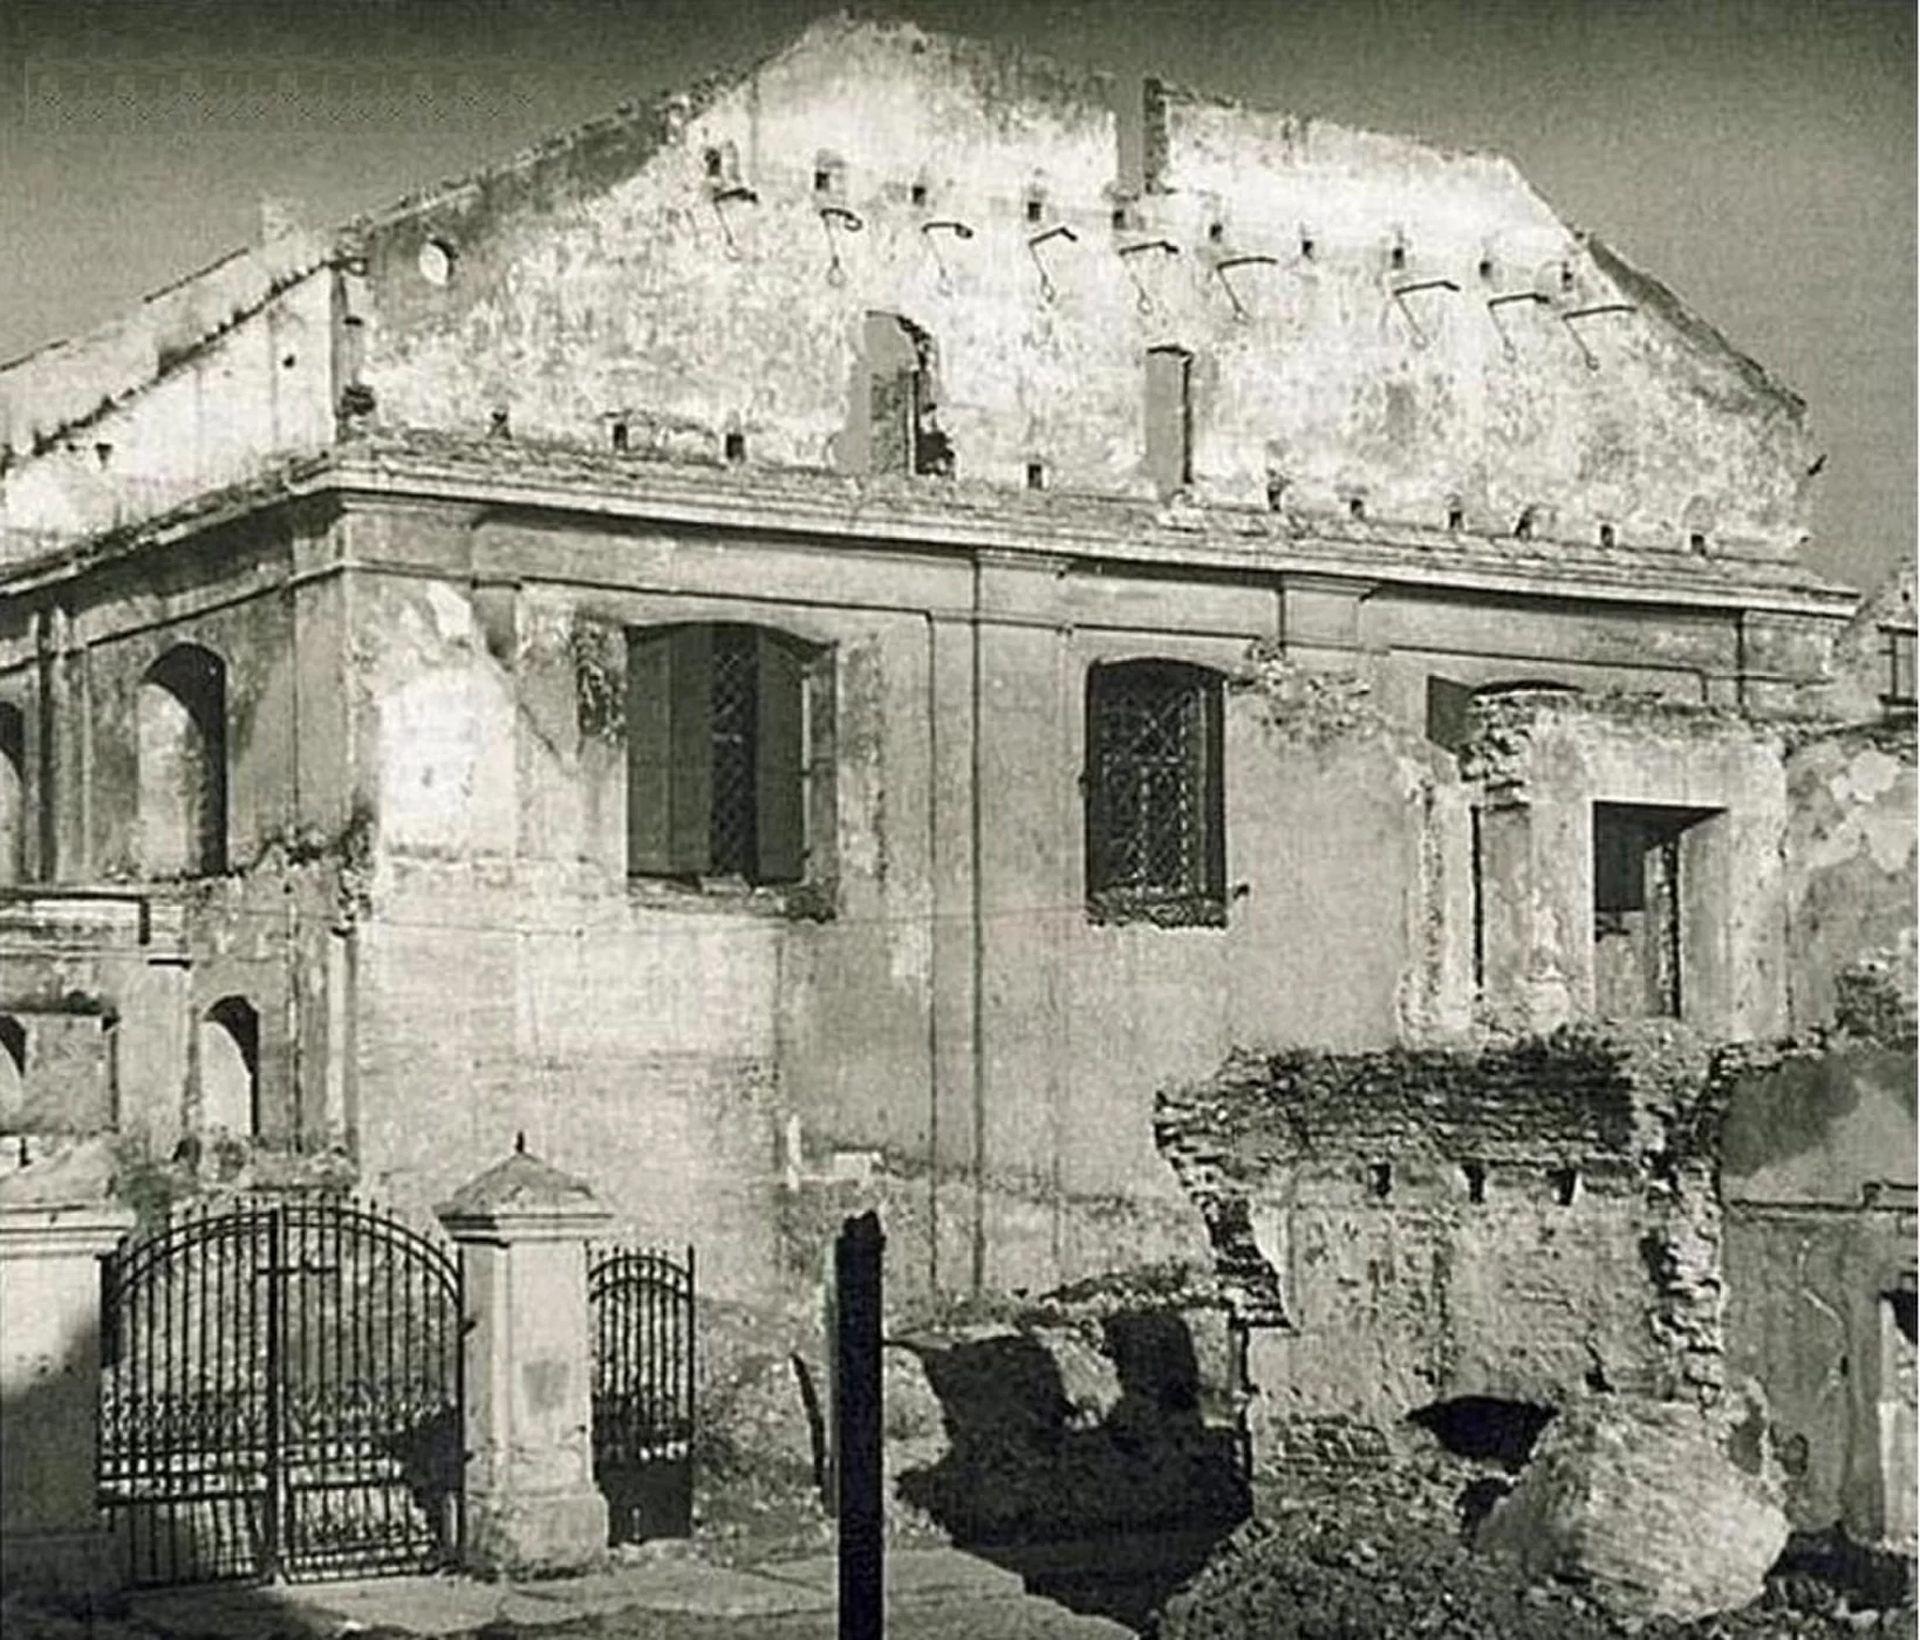 Grande Sinagoga de Vilna foi destruída após incêndio provocado durante a Segunda Guerra Mundial (Foto: Vilna Great Synagogue and Shulhoyf Research Project)